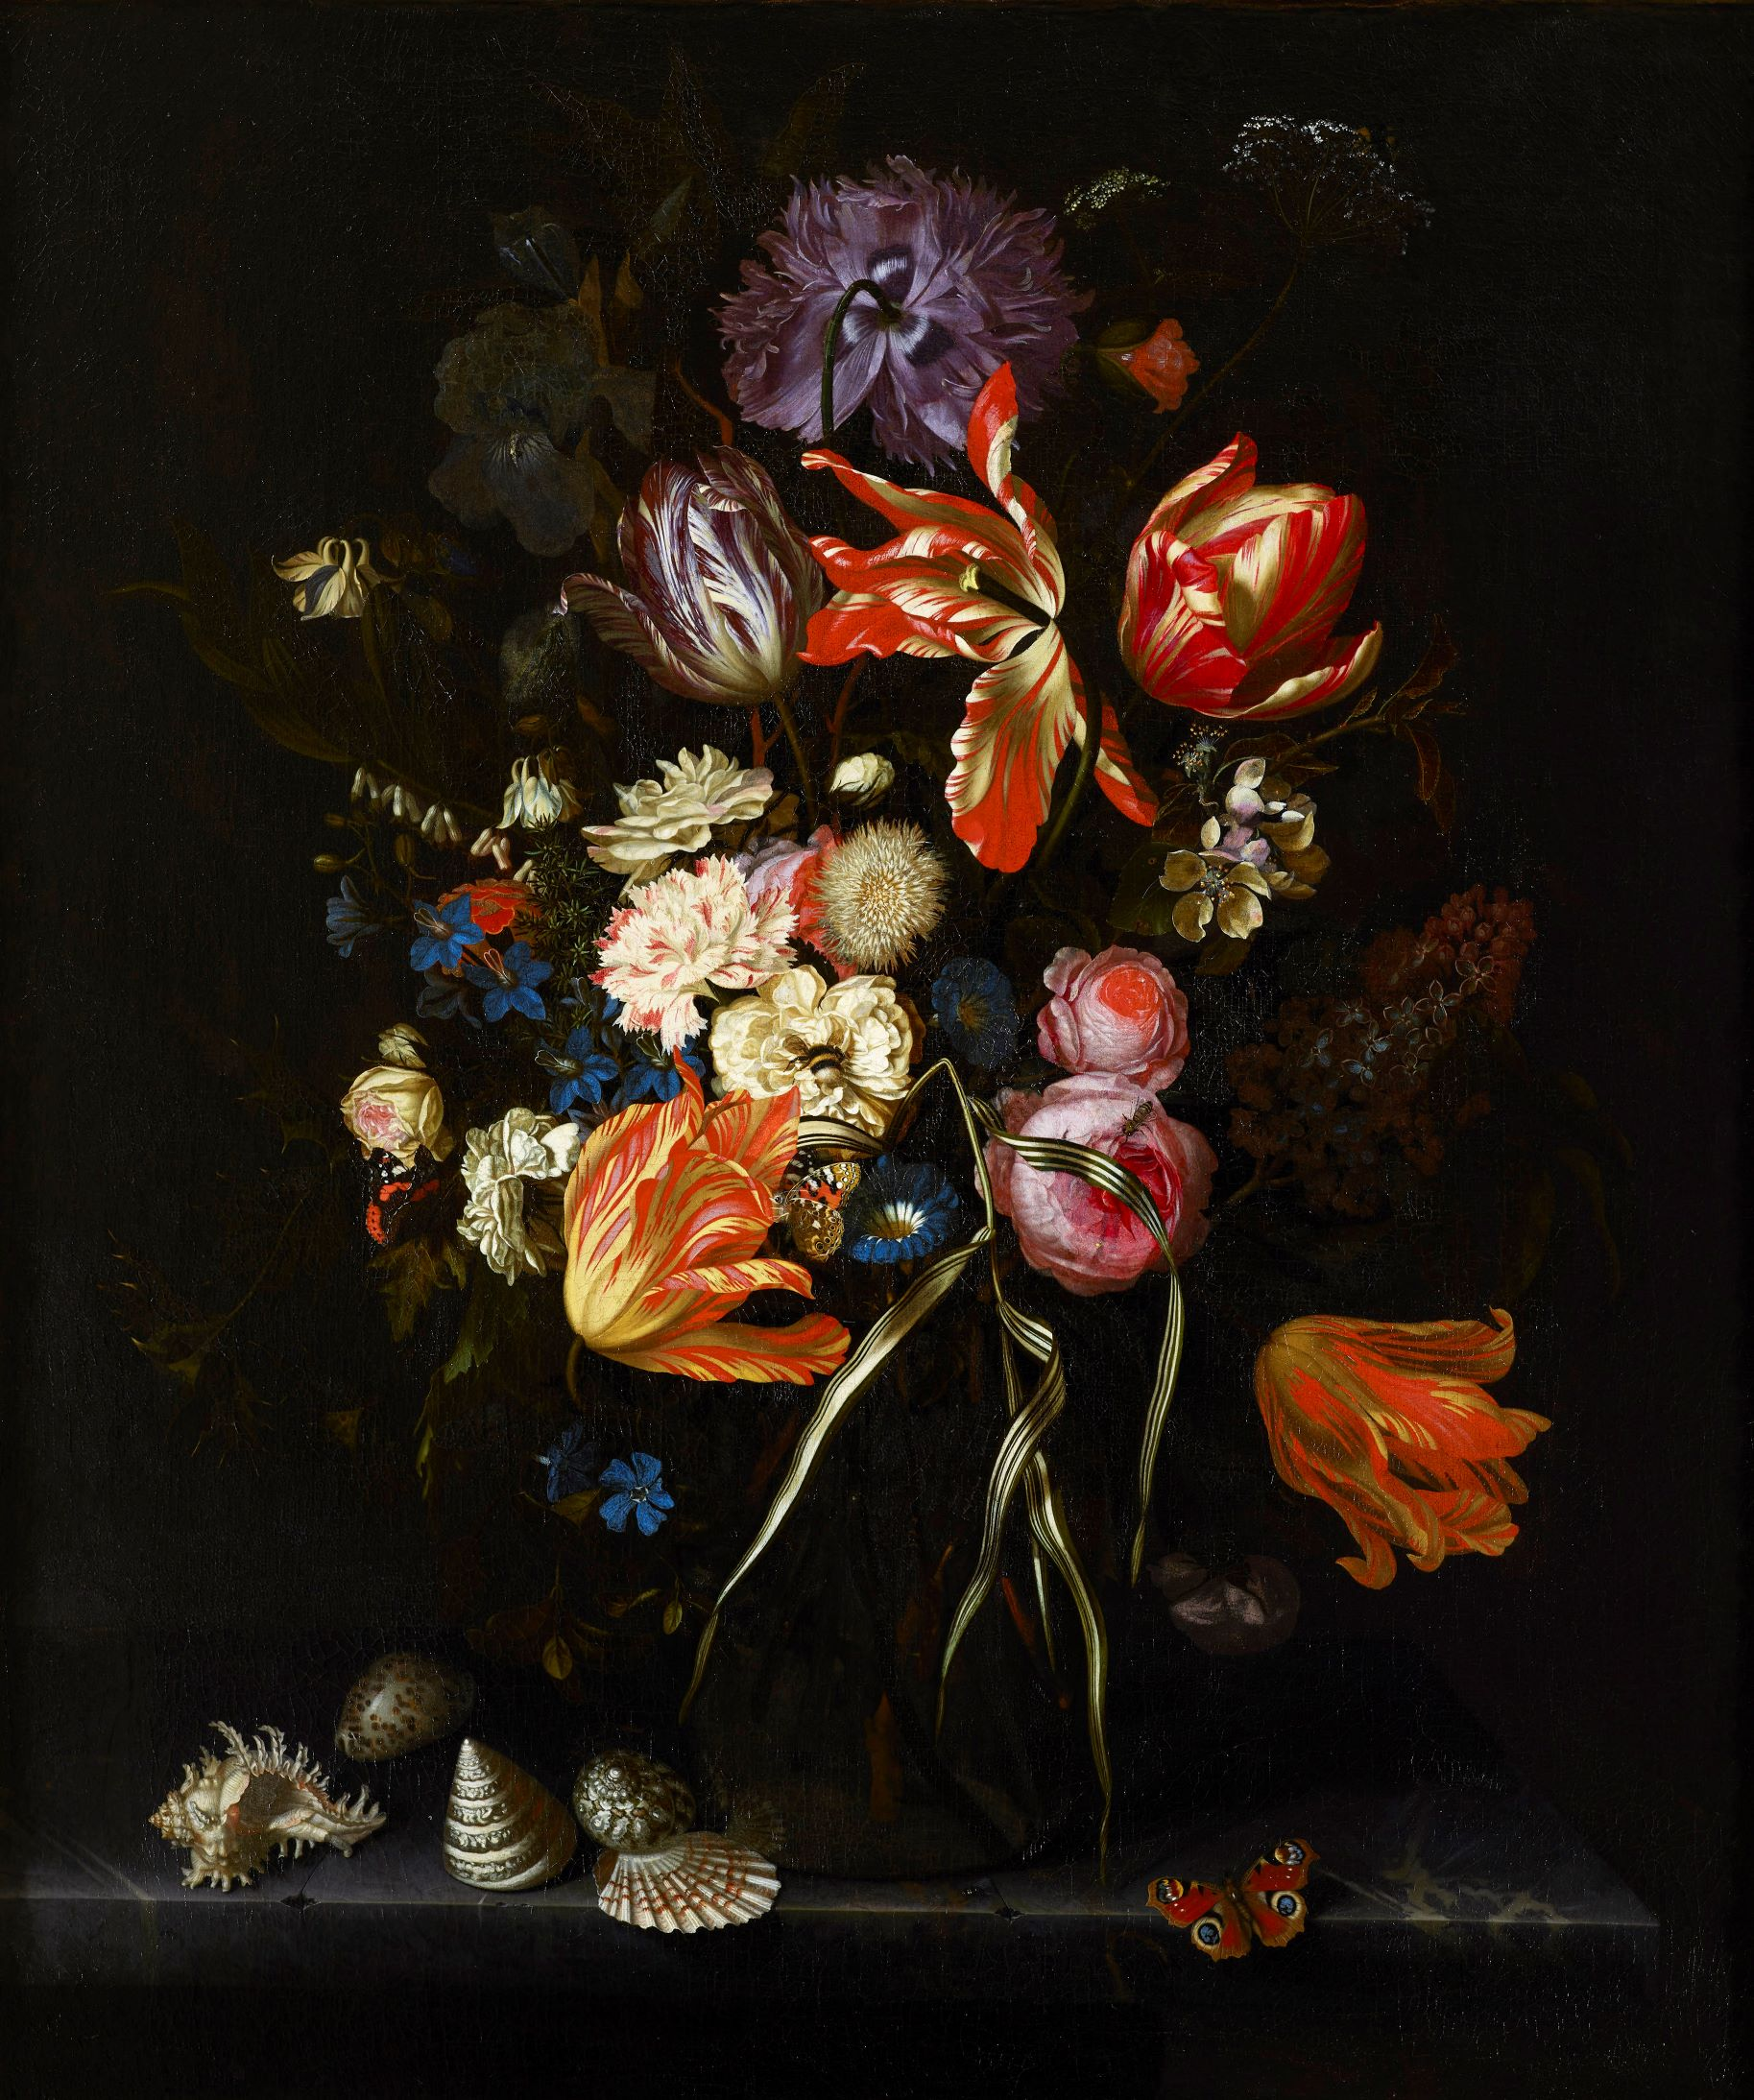 Maria van Oosterwyck (1630–1693), <em>Still Life of Flowers in a Glass Vase</em>, ca. 1685 Joslyn Art Museum, Omaha